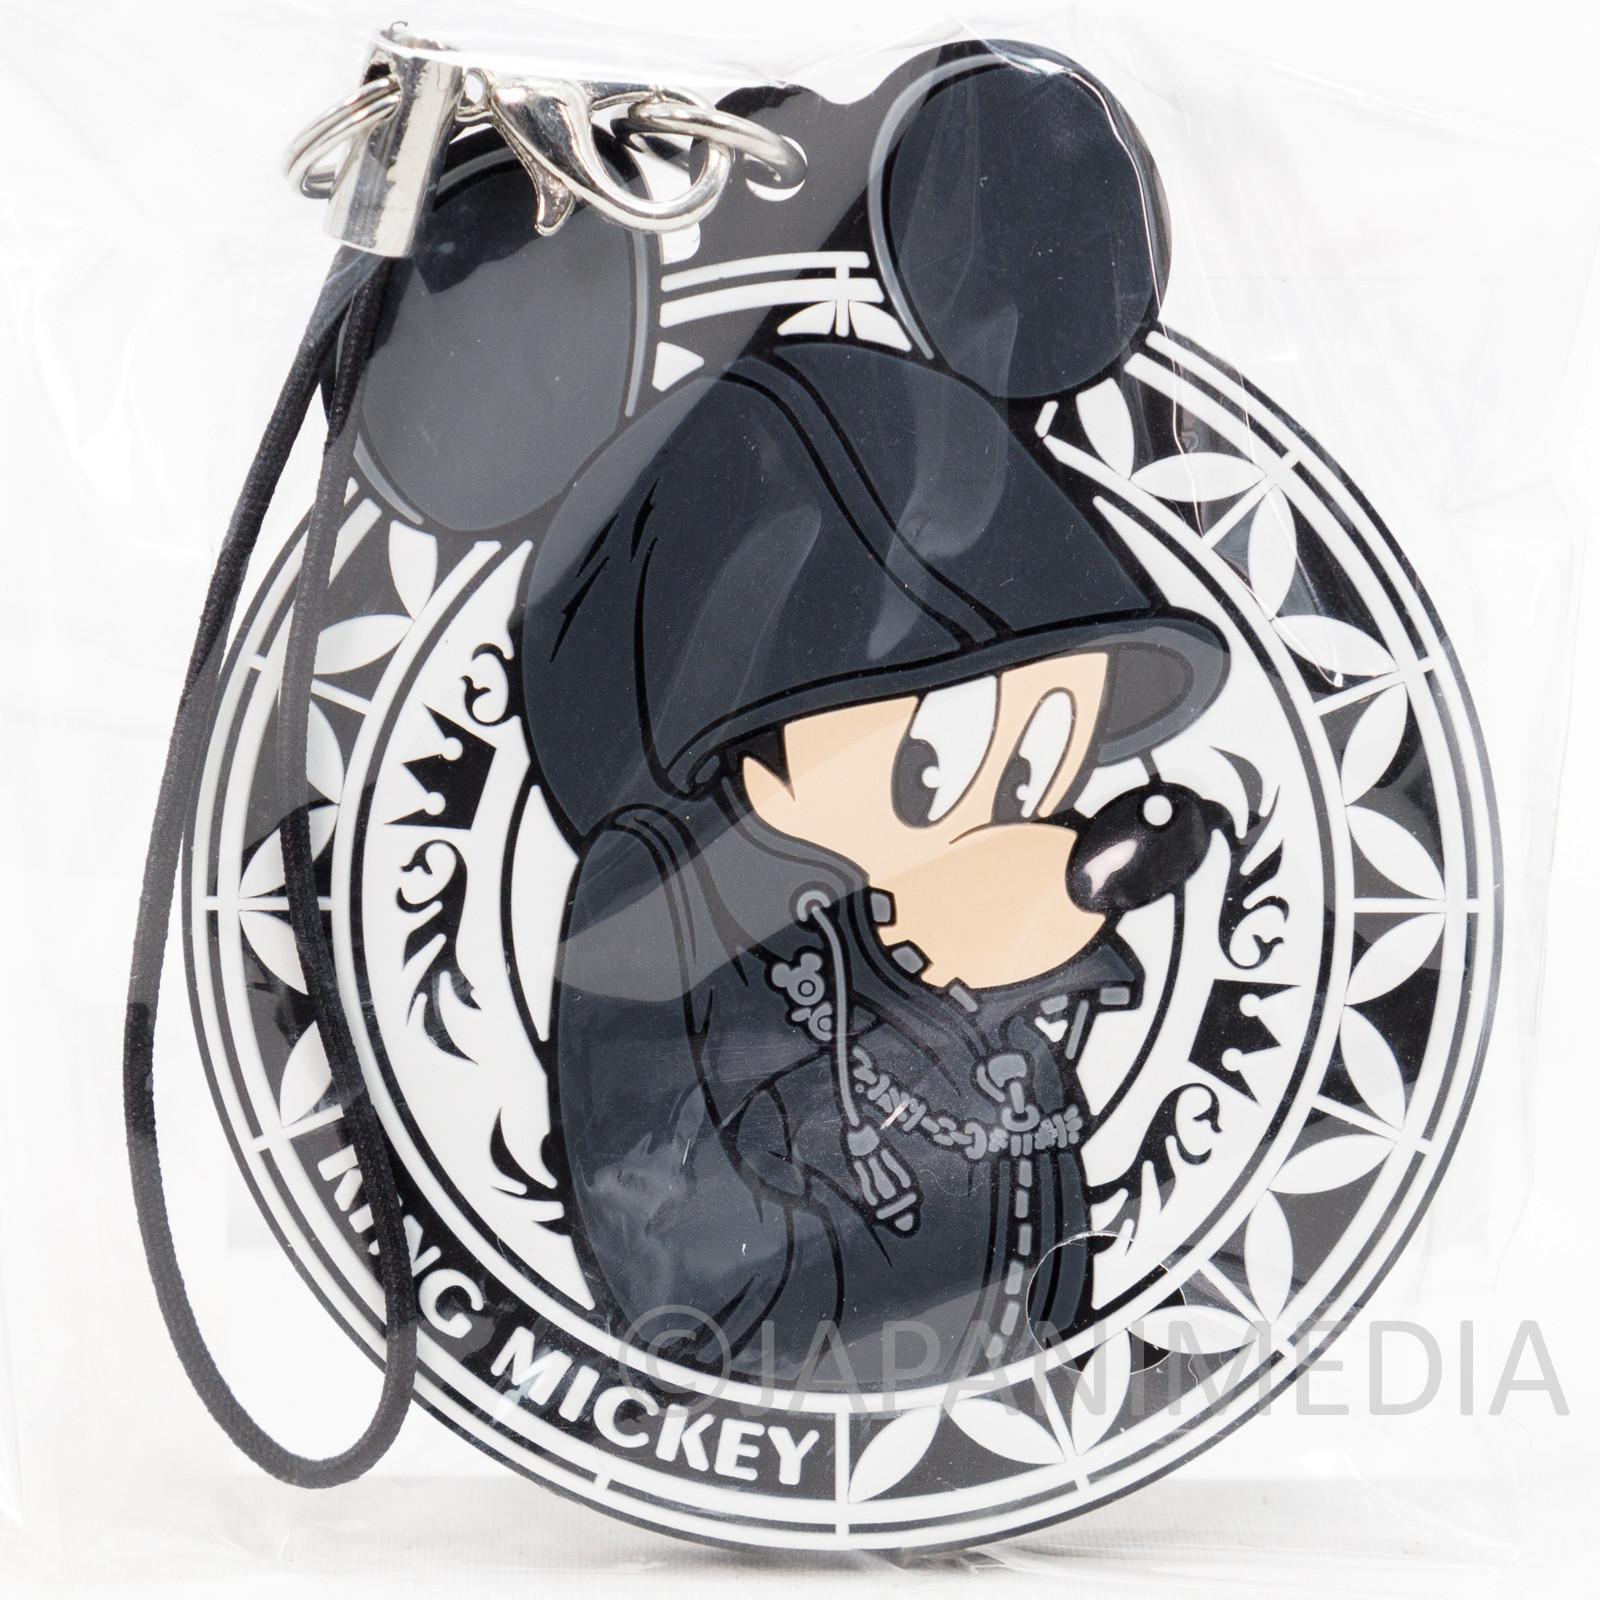 Kingdom Hearts KING MICKEY Mascot Rubber Strap Square Enix JAPAN